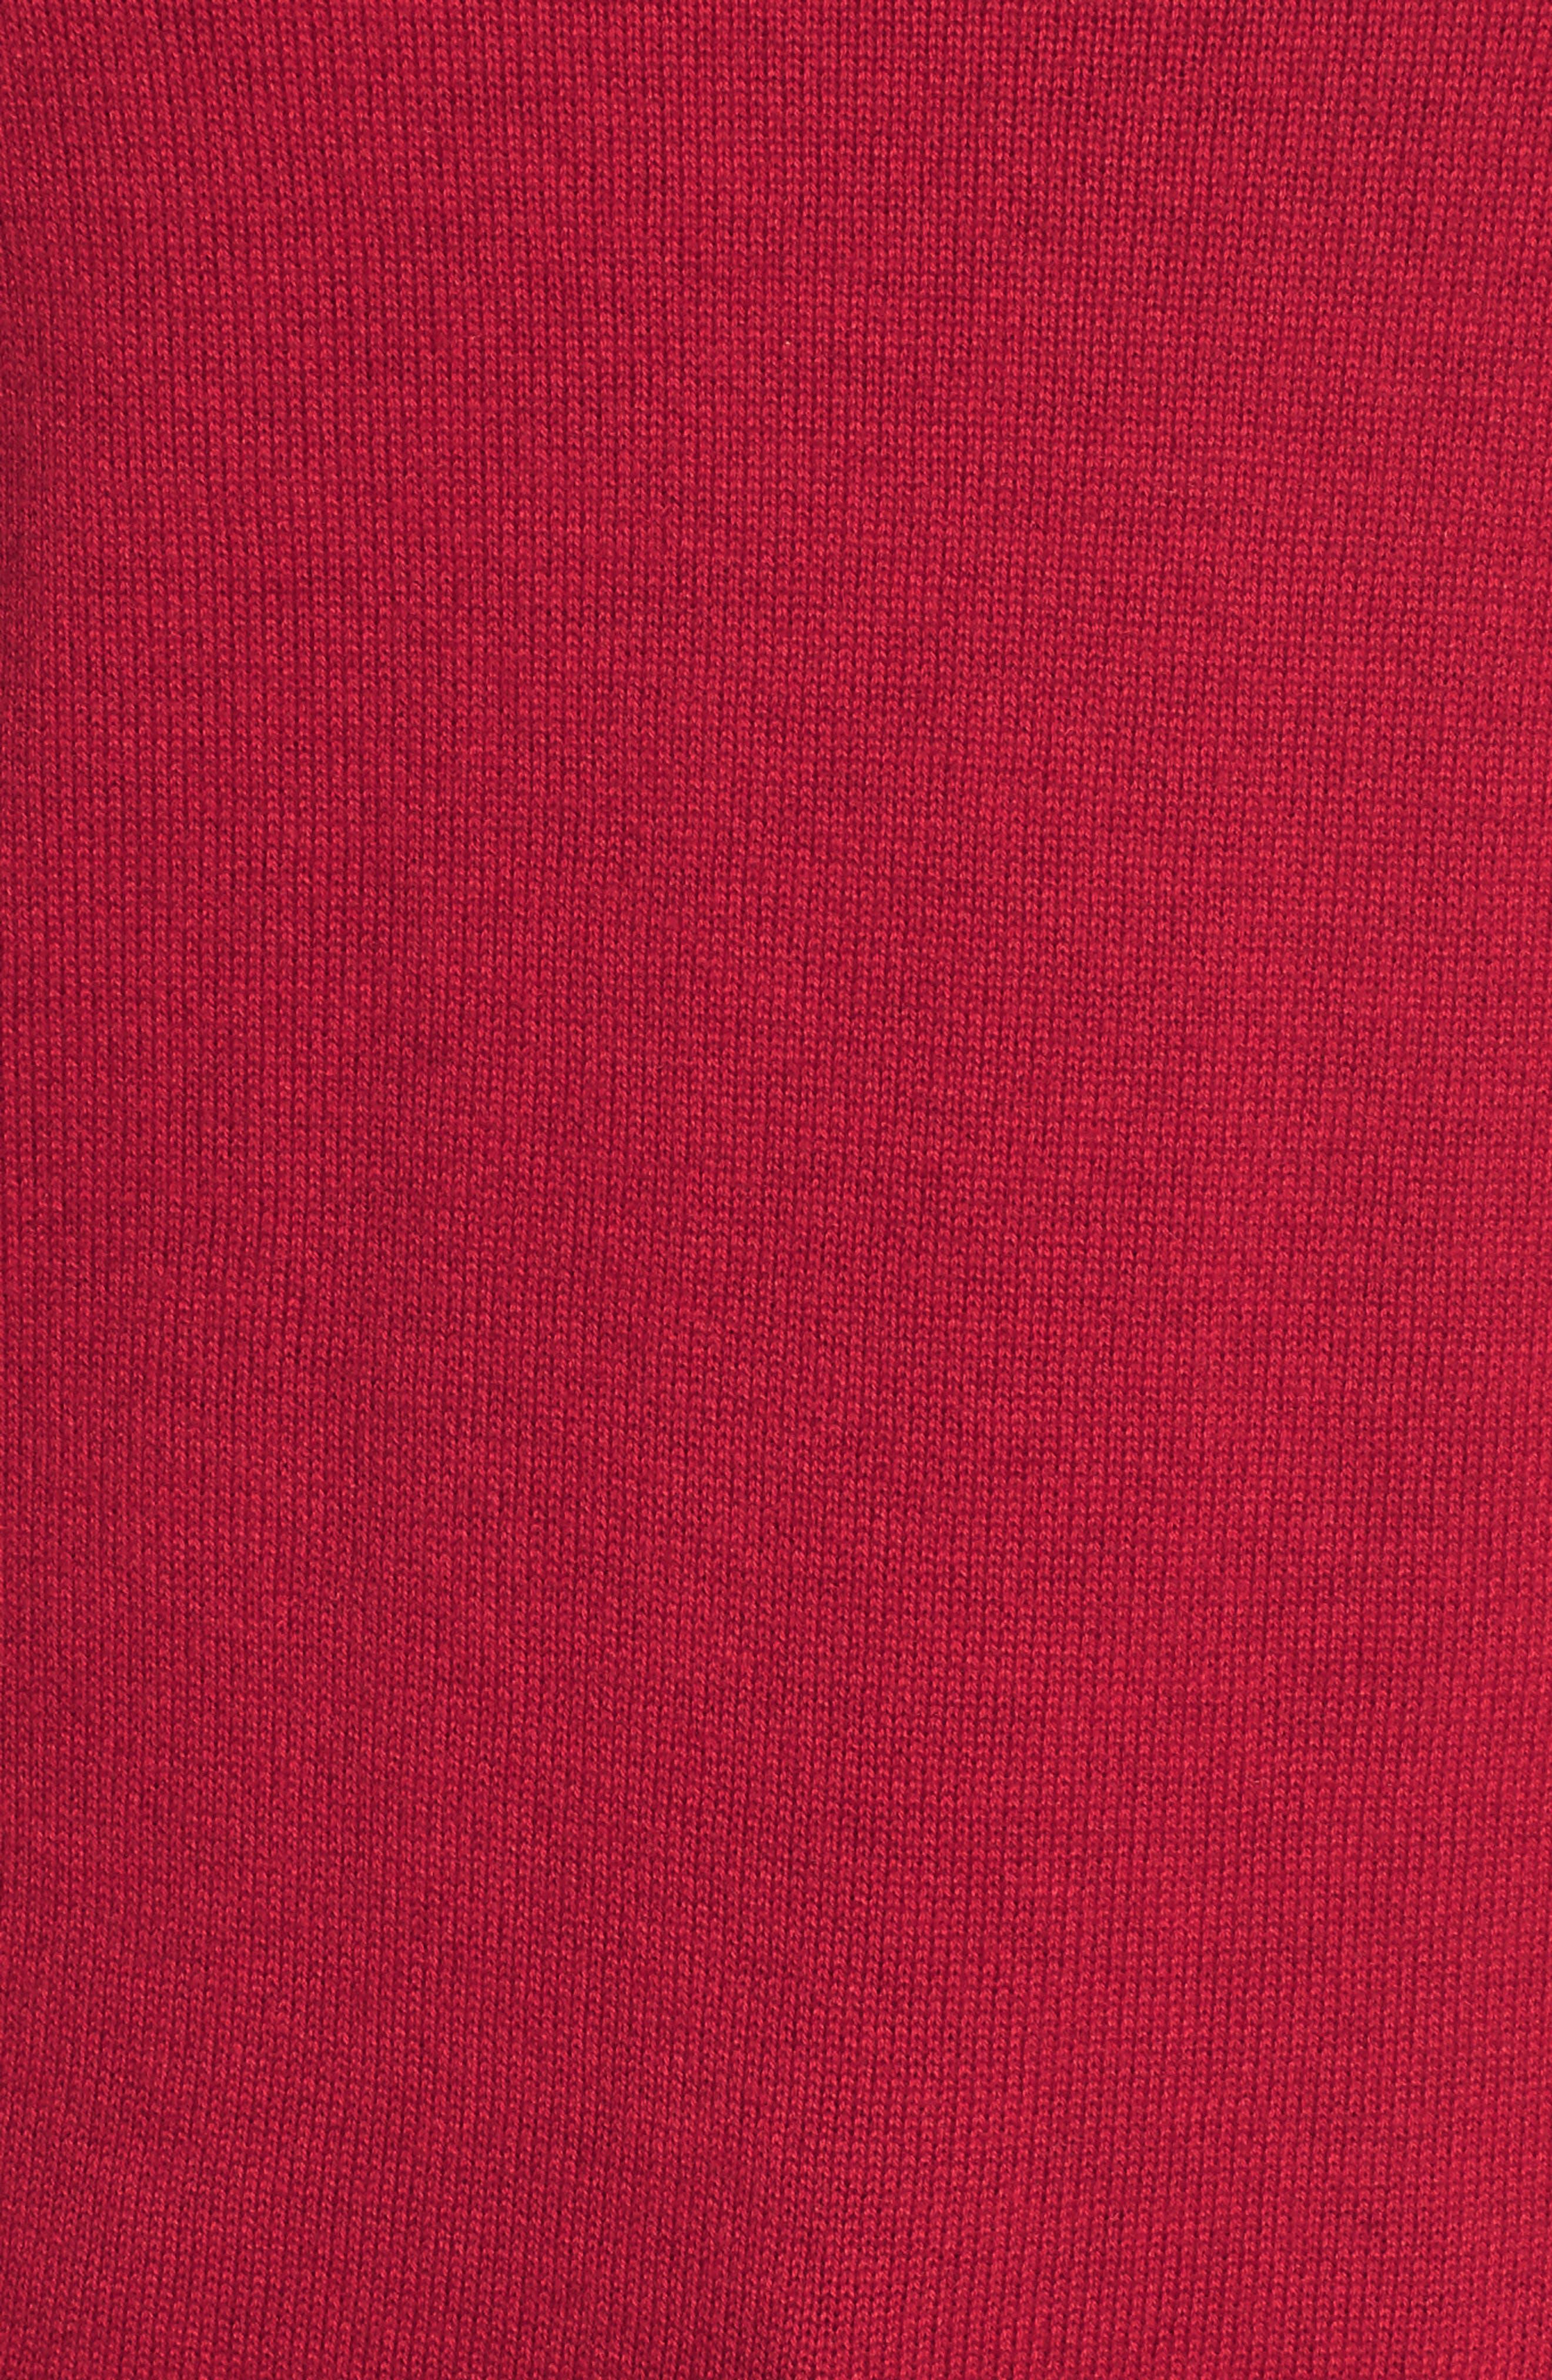 Bell Sleeve Choker Neck Sweater,                             Alternate thumbnail 25, color,